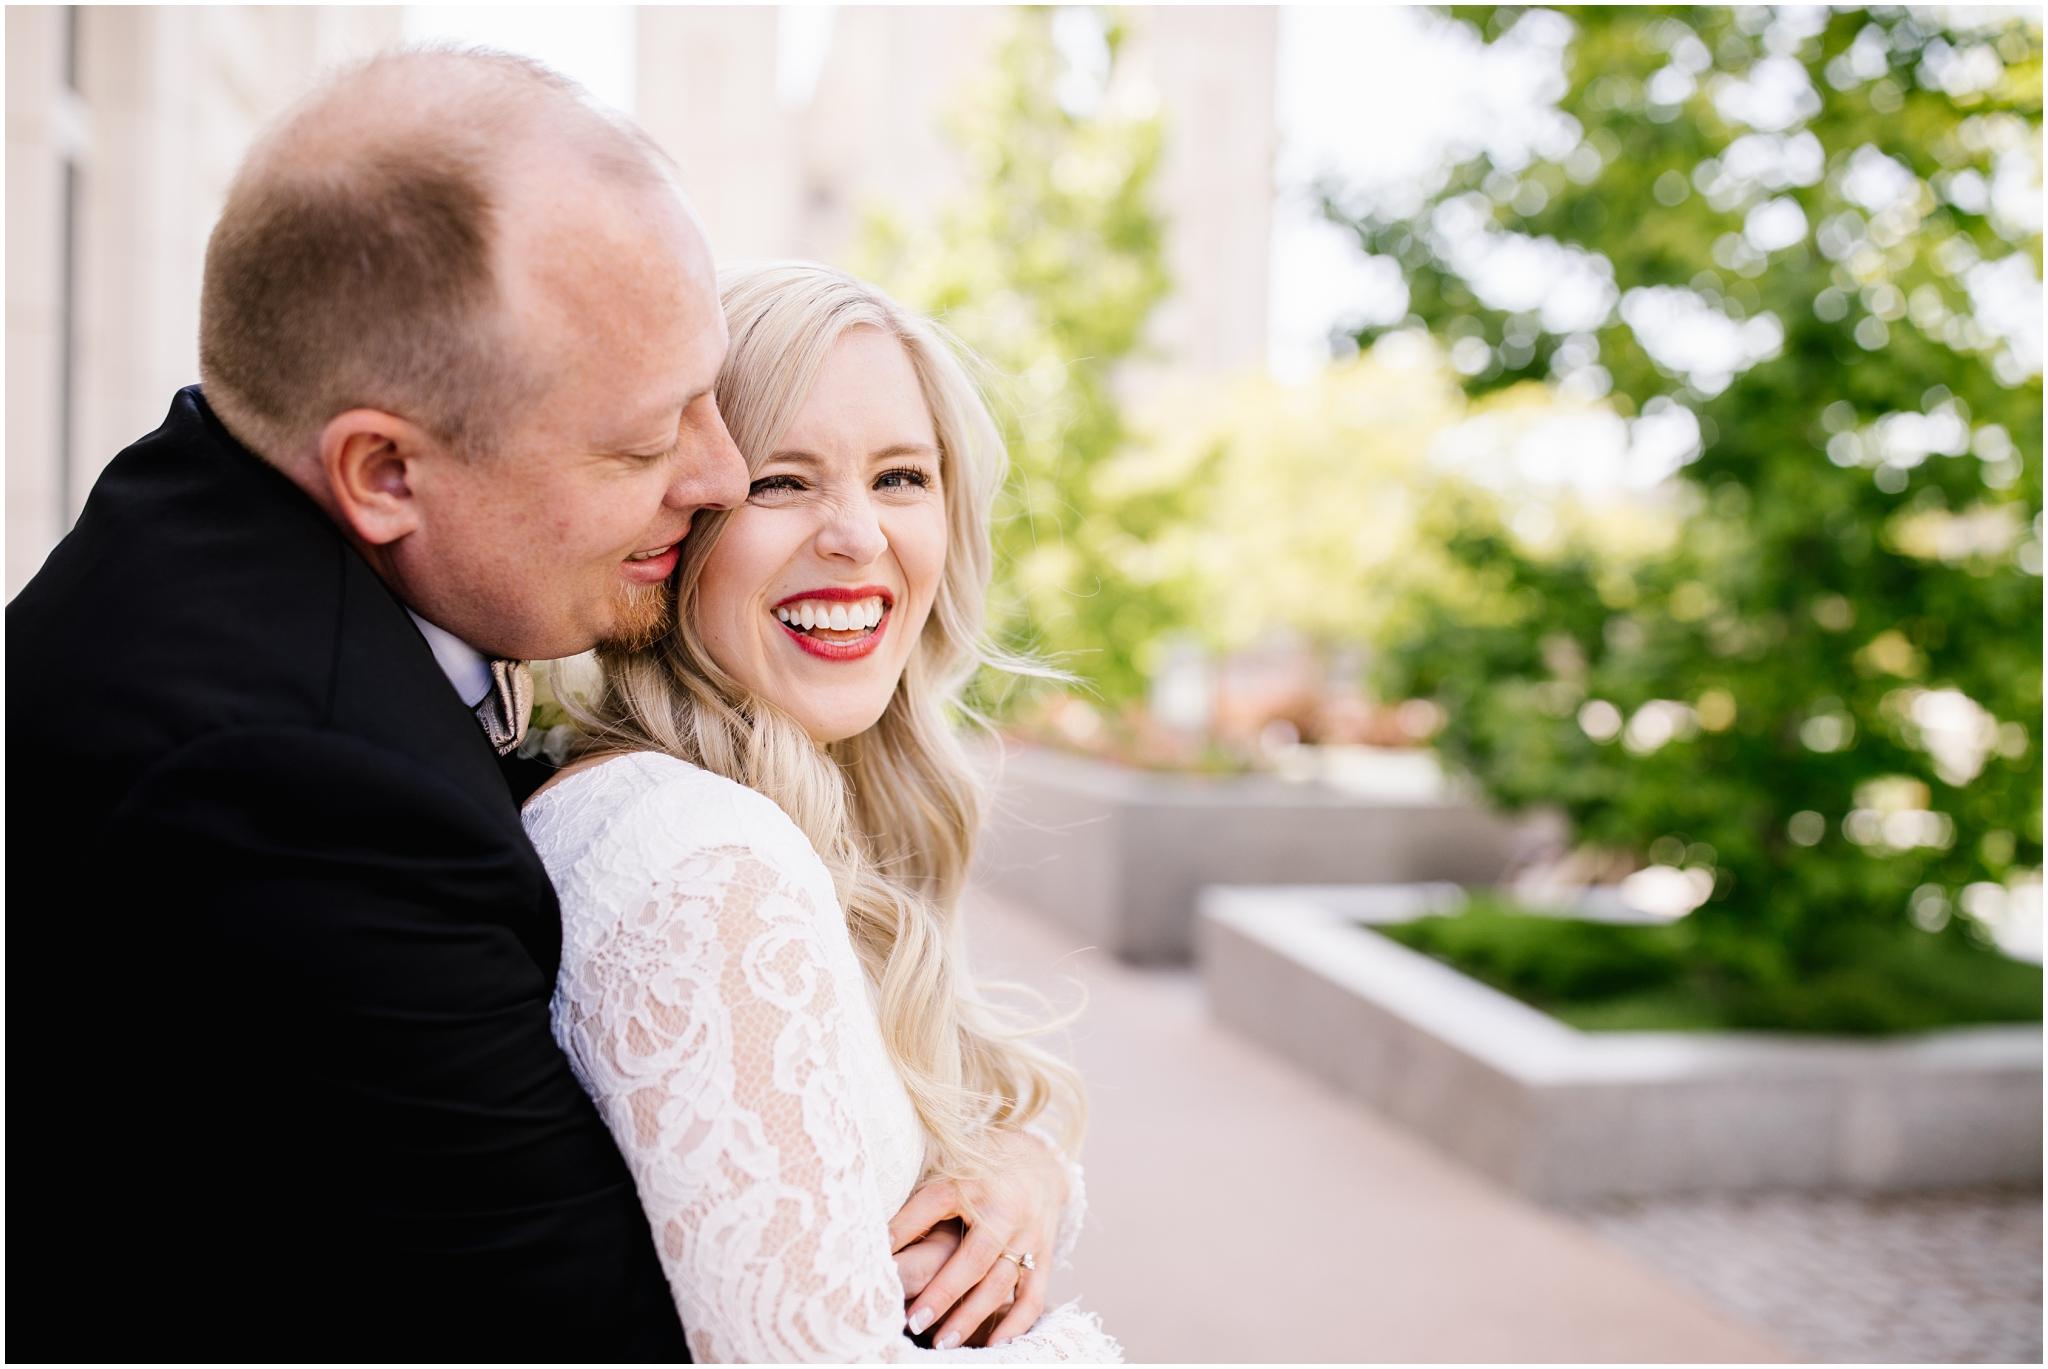 CherylandTyler-292_Lizzie-B-Imagery-Utah-Wedding-Photographer-Salt-Lake-City-Temple-Wells-Fargo-Building-Reception.jpg